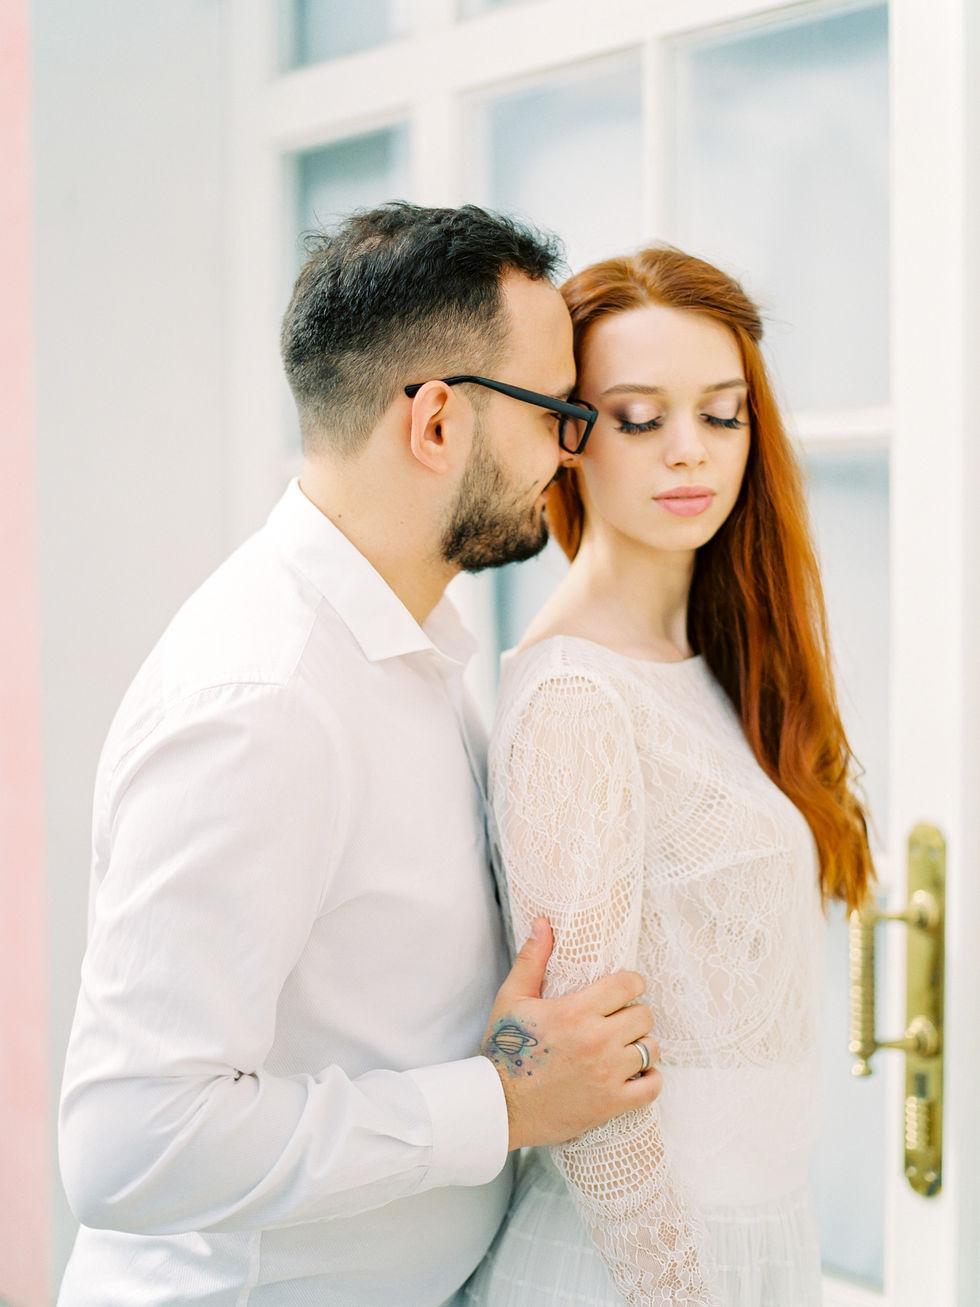 2019.05.10 Irina & Bogdan Kuskovo-01.jpg